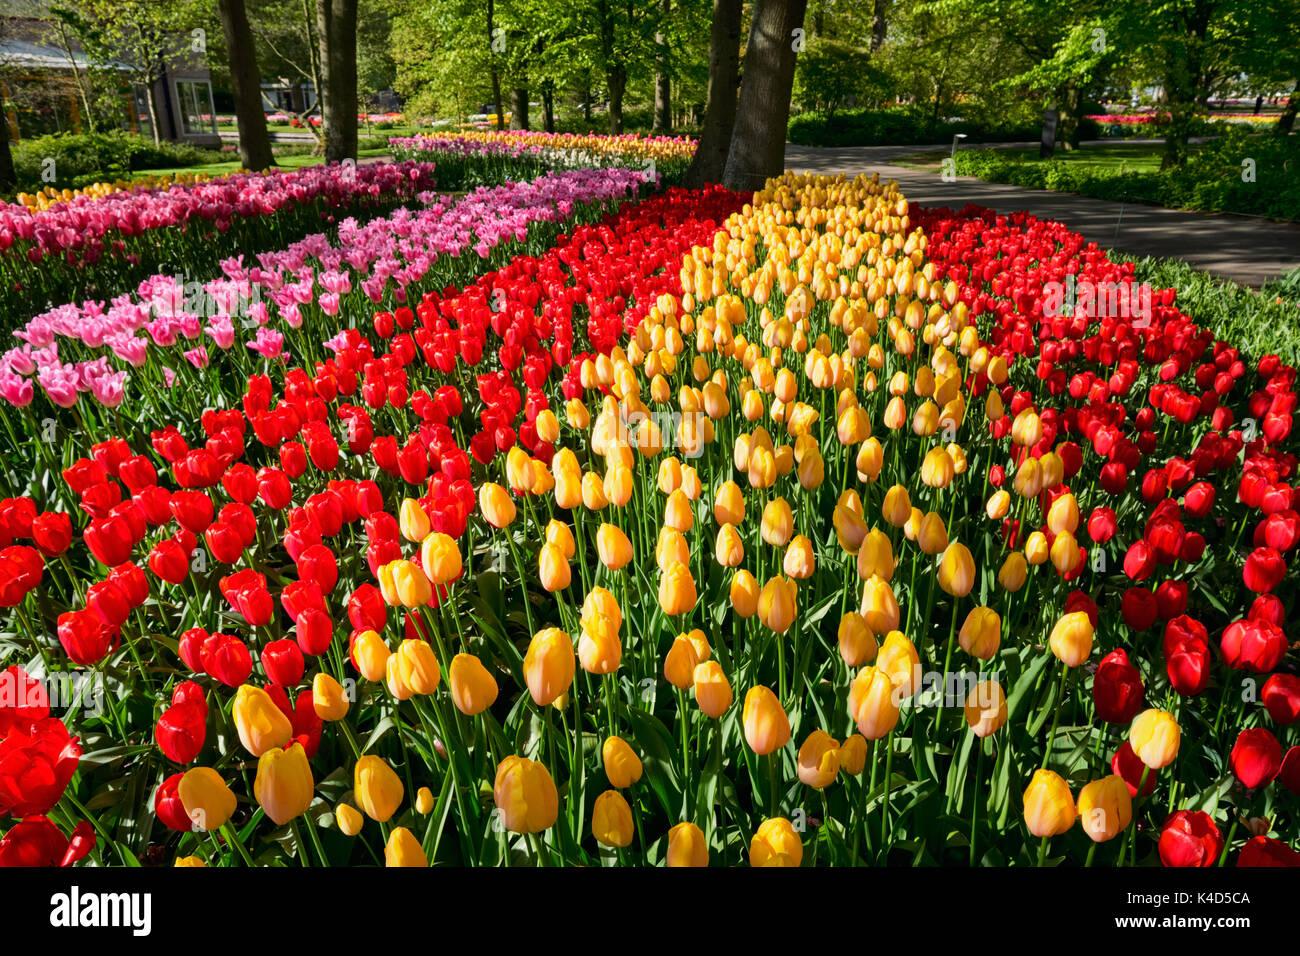 Blooming tulips flowerbed in Keukenhof flower garden, Netherland - Stock Image